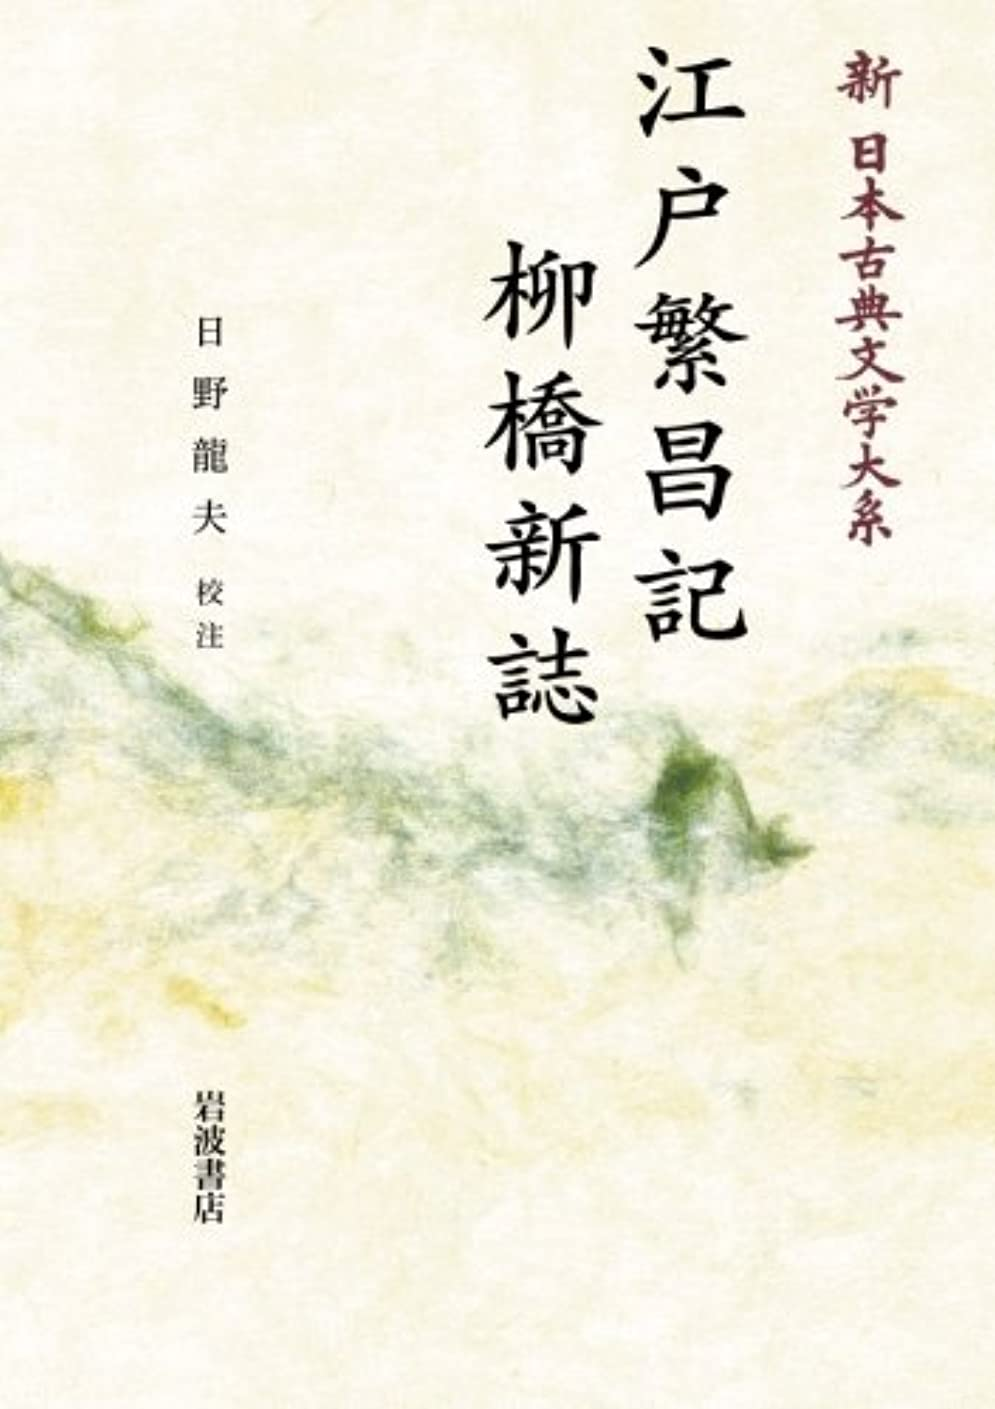 彫刻家クロールに向けて出発江戸繁昌記 柳橋新誌 (新日本古典文学大系 100)